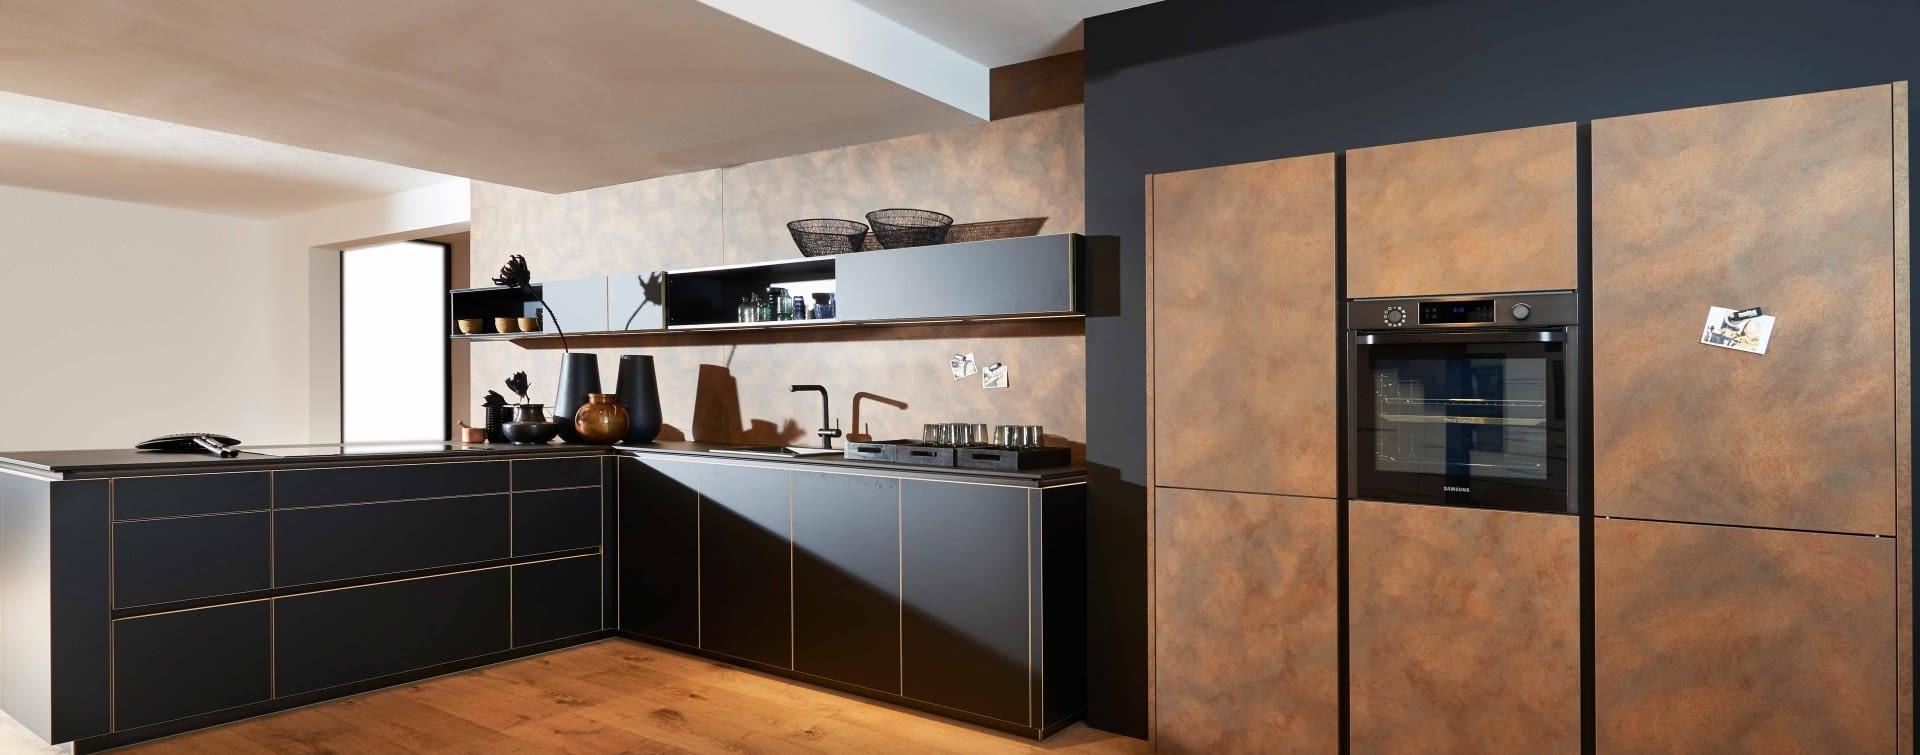 die k chentrends des jahres 2018 marquardt k chen. Black Bedroom Furniture Sets. Home Design Ideas